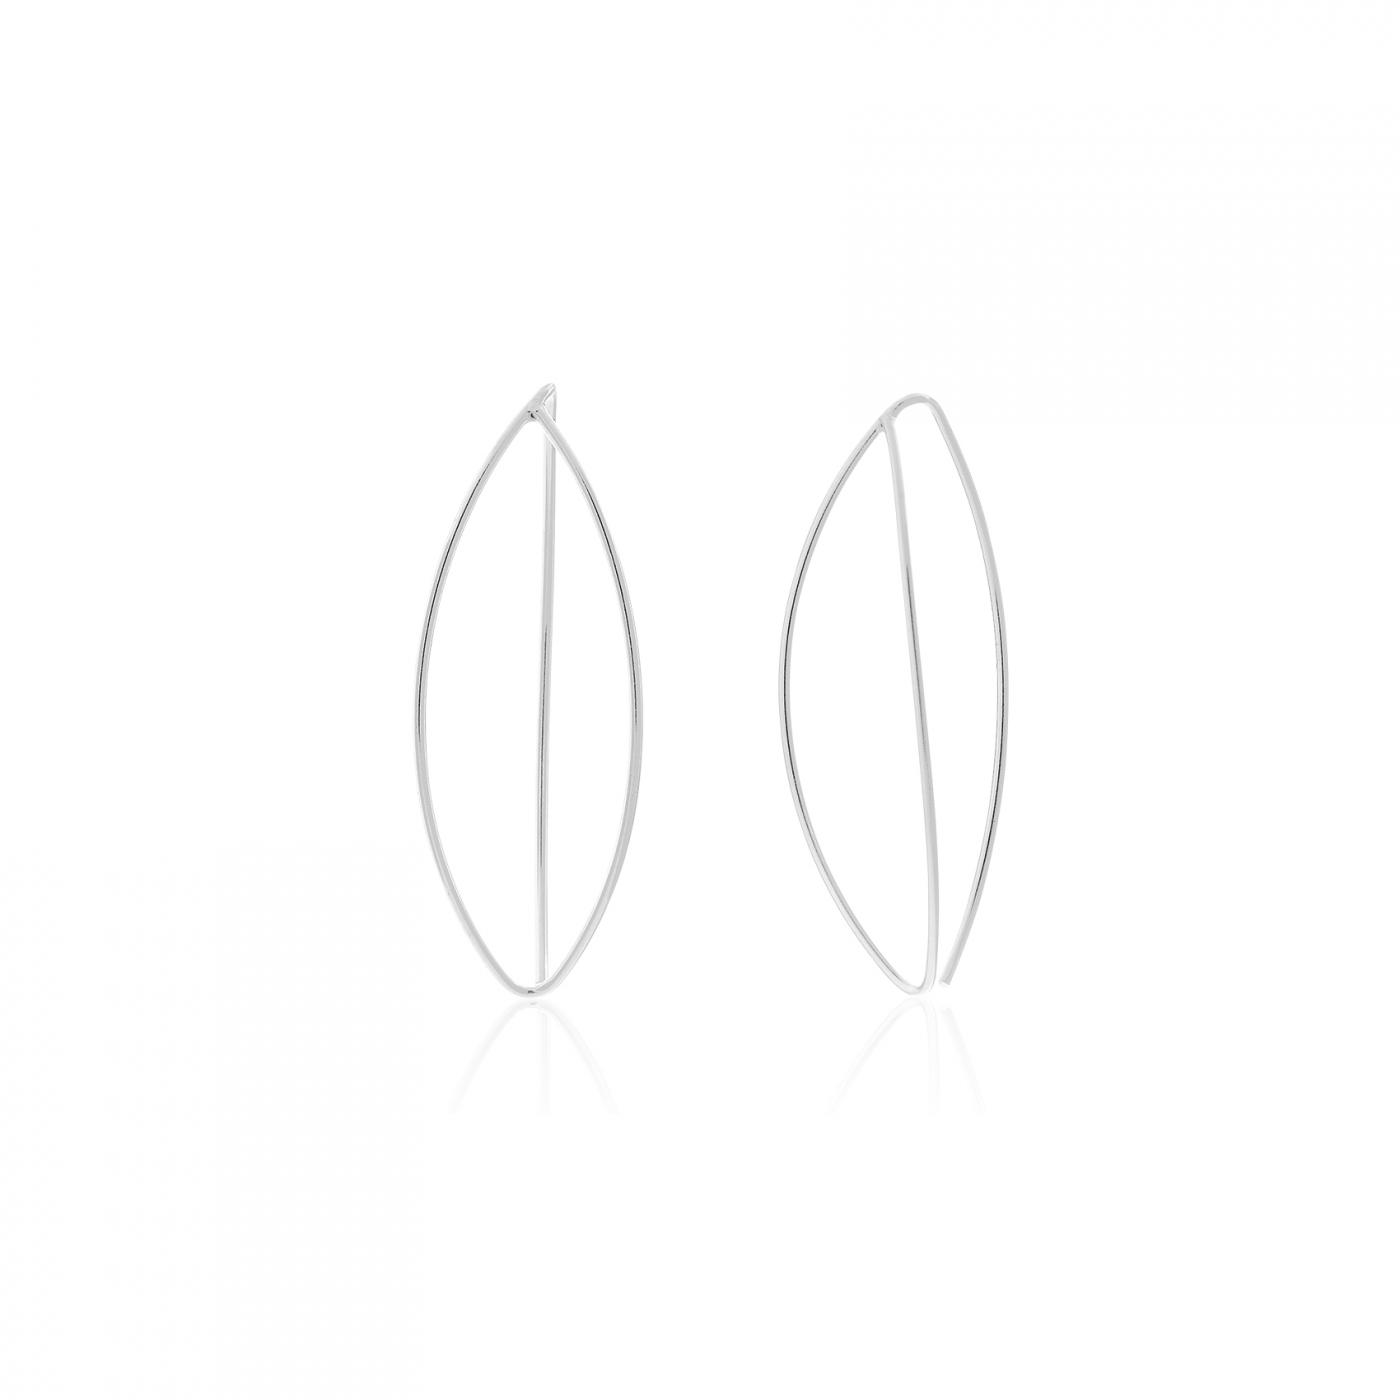 Draken Together-big-earrings-webb-1400x1400.jpg